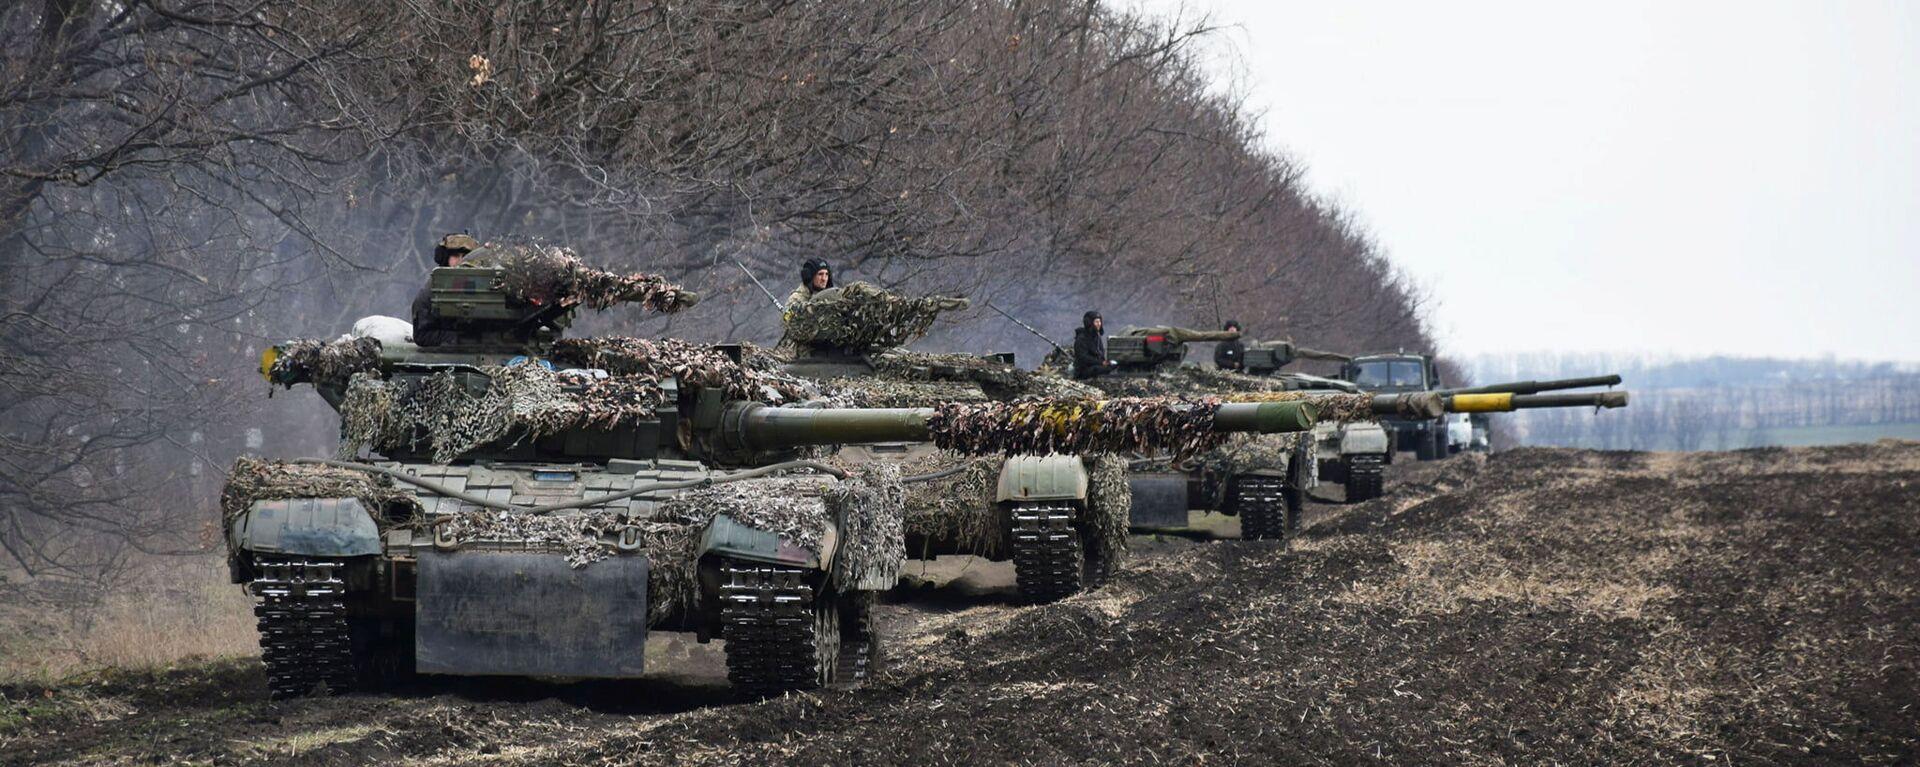 Konflikt zbrojny w Donbasie. - Sputnik Polska, 1920, 07.07.2021